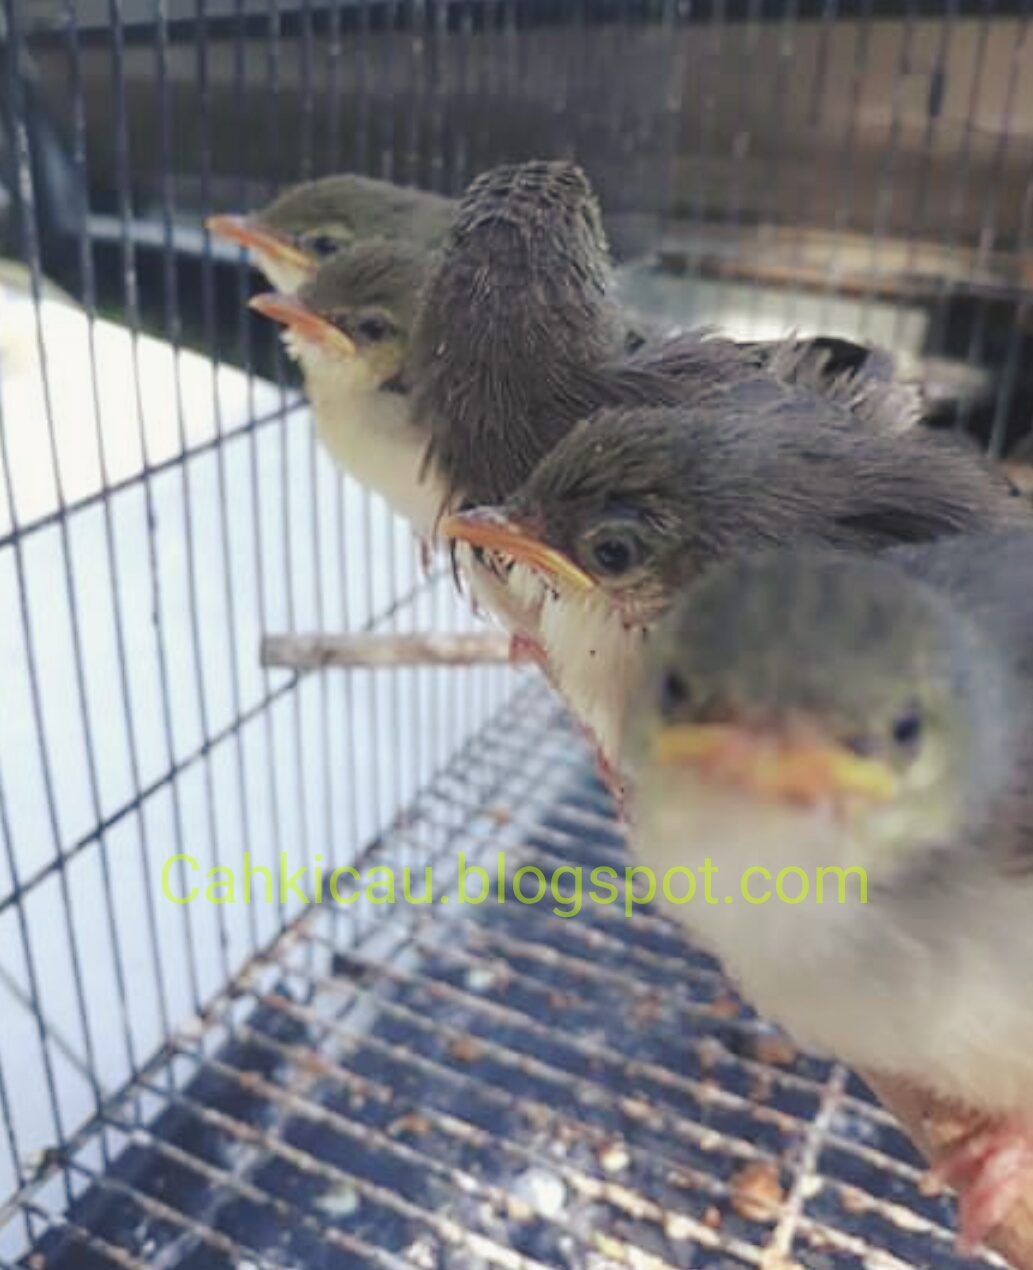 Hobi Burung Kicauan Cara Membedakan Anakan Ciblek Gunung Jantan Dan Betina